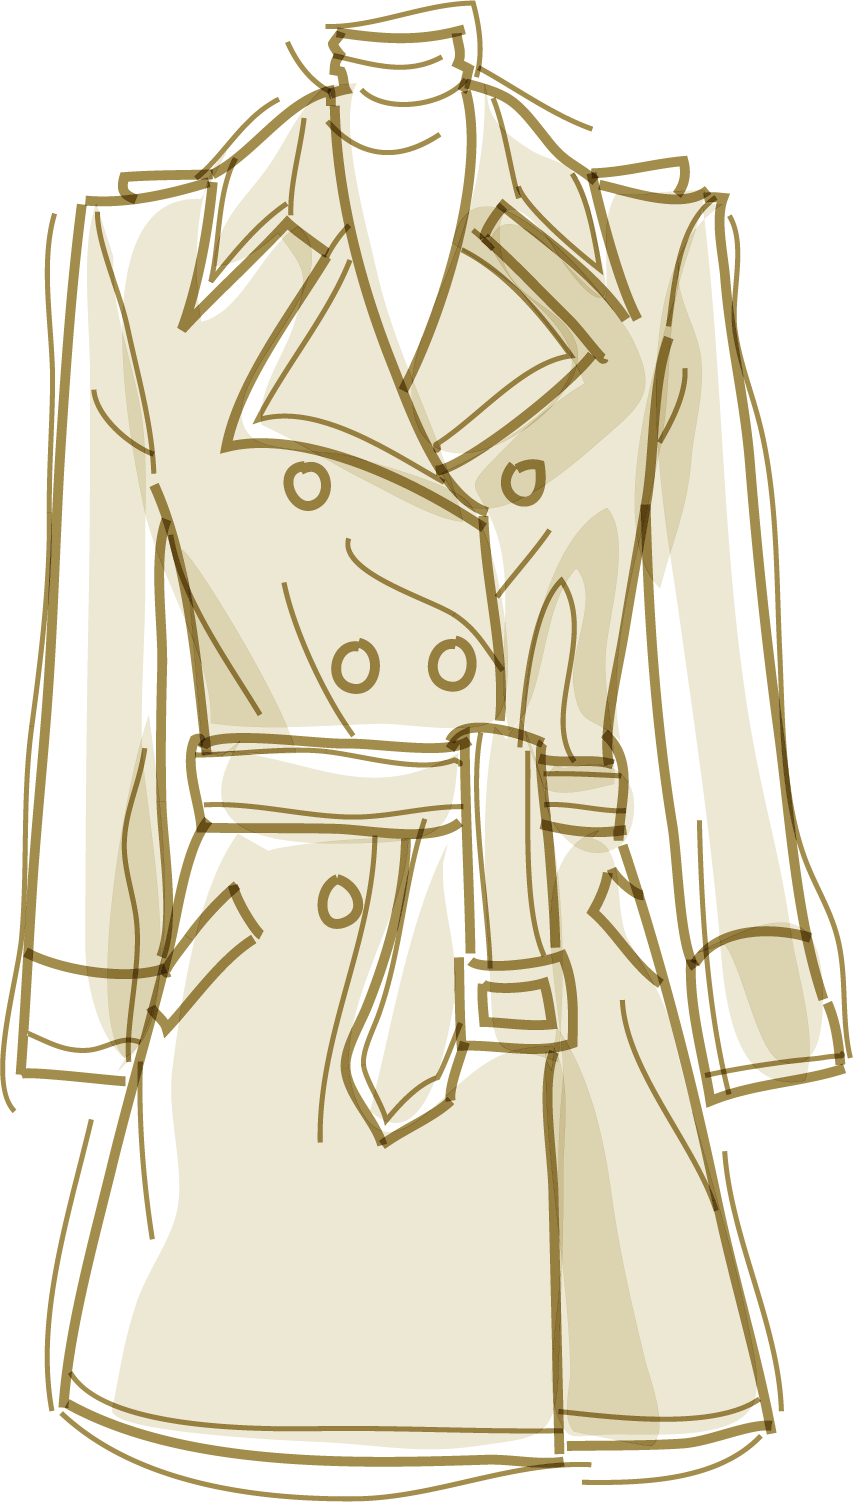 853x1502 Trench Coat Dress Windbreaker